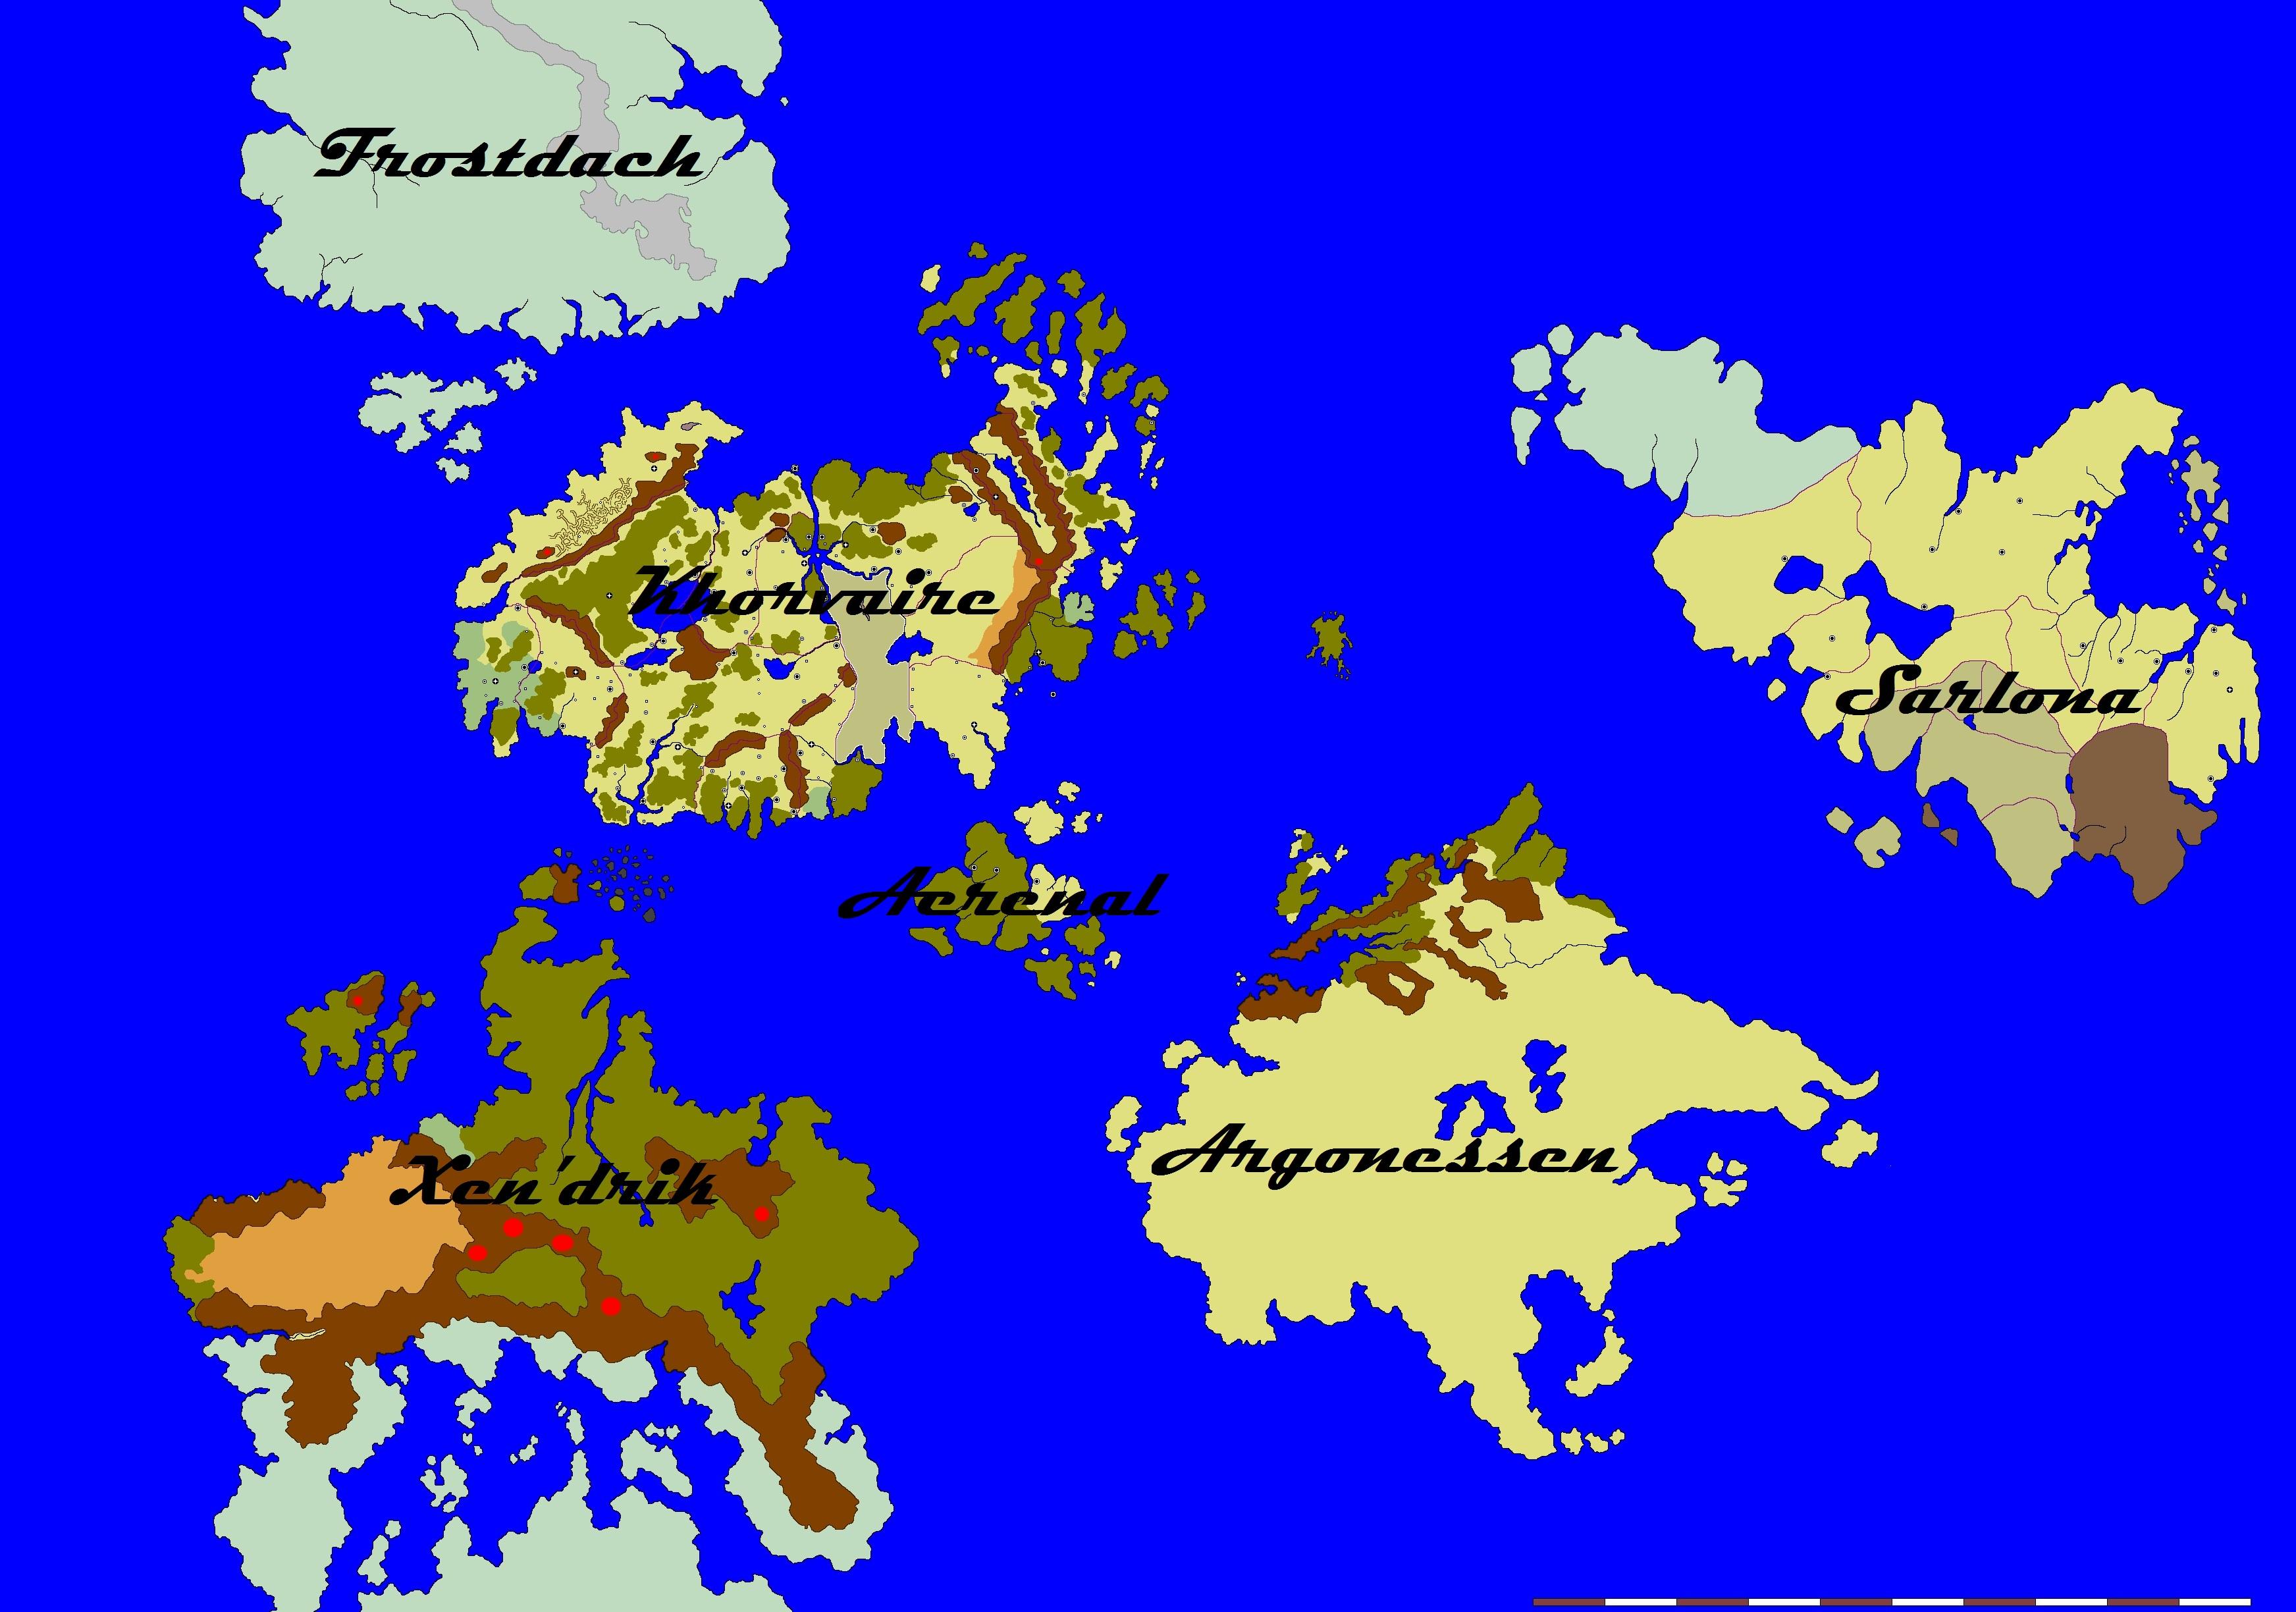 Http://cdn.obsidianportal.com/map_images/310856/Eberron_ _Weltkarte |  Fantasy | Maps | Pinterest | Fantasy Map